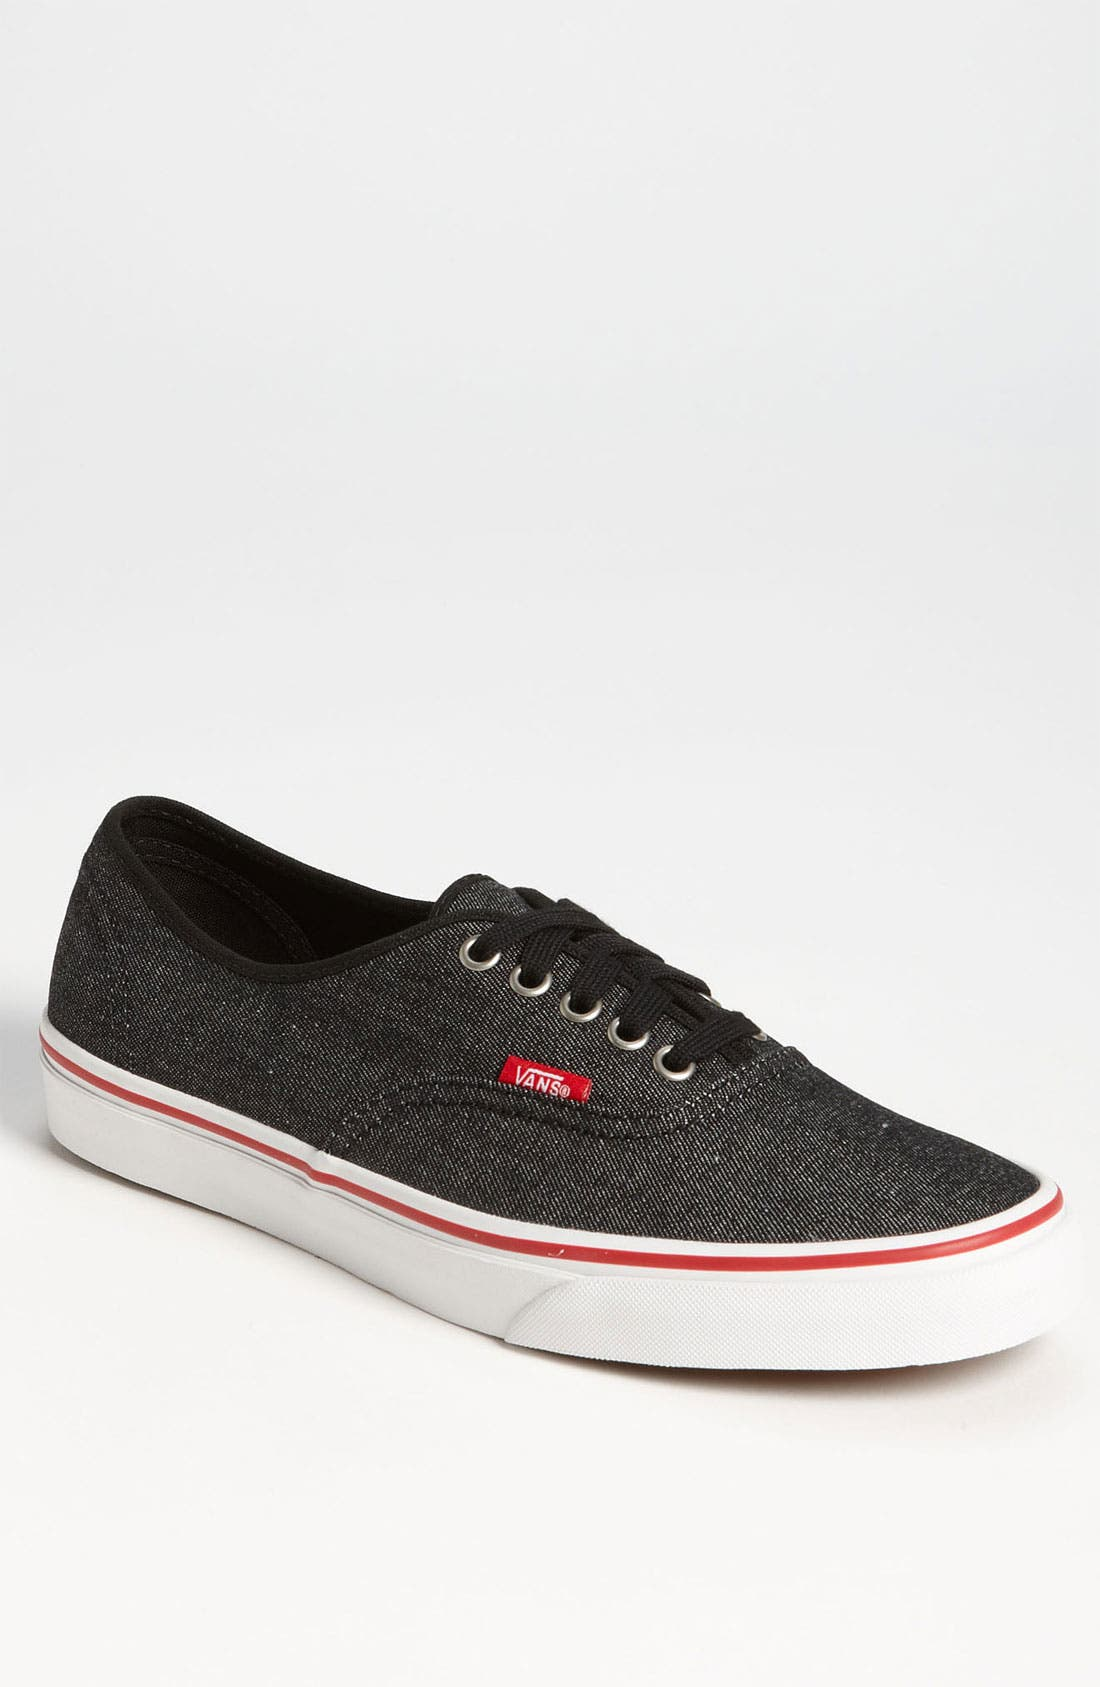 Alternate Image 1 Selected - Vans 'Authentic' Sneaker (Men)